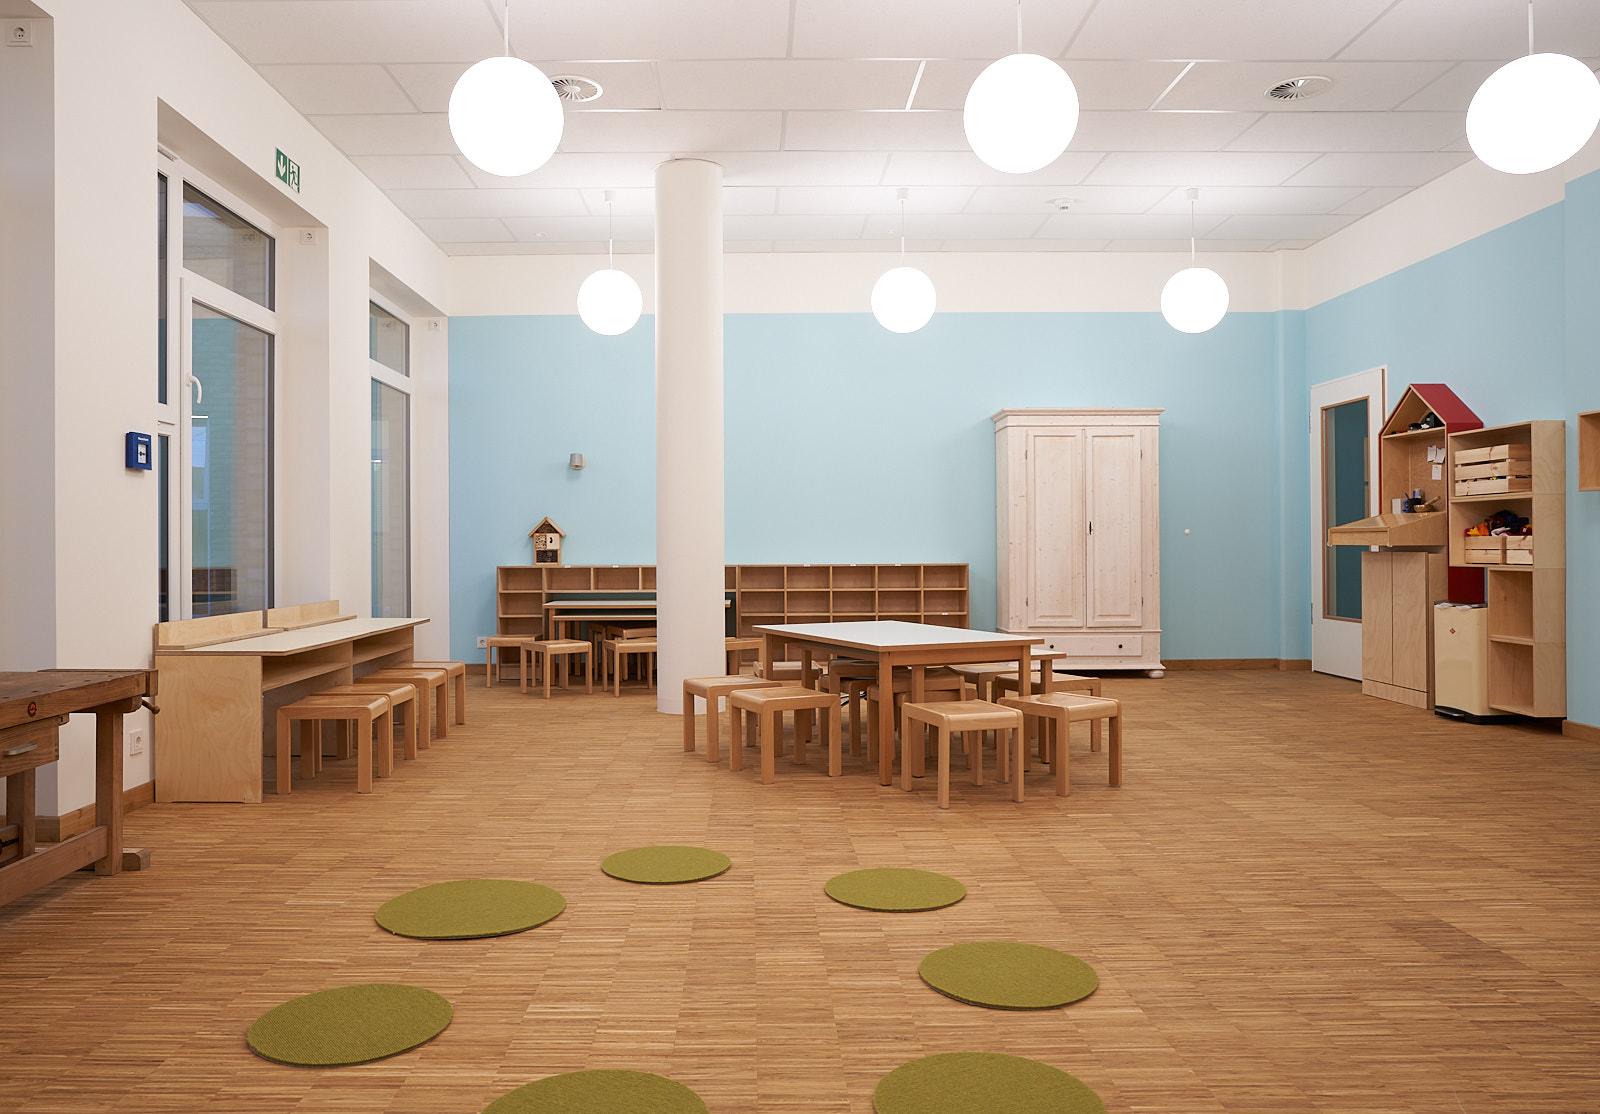 Hamburg, Neue Mitte Altona, Moete, Kita Sandvika, Forscherraum, Lernwerkstatt, Kita, Kindergarten, Kindertagesstätte, Elementarpädagogik 01.jpg